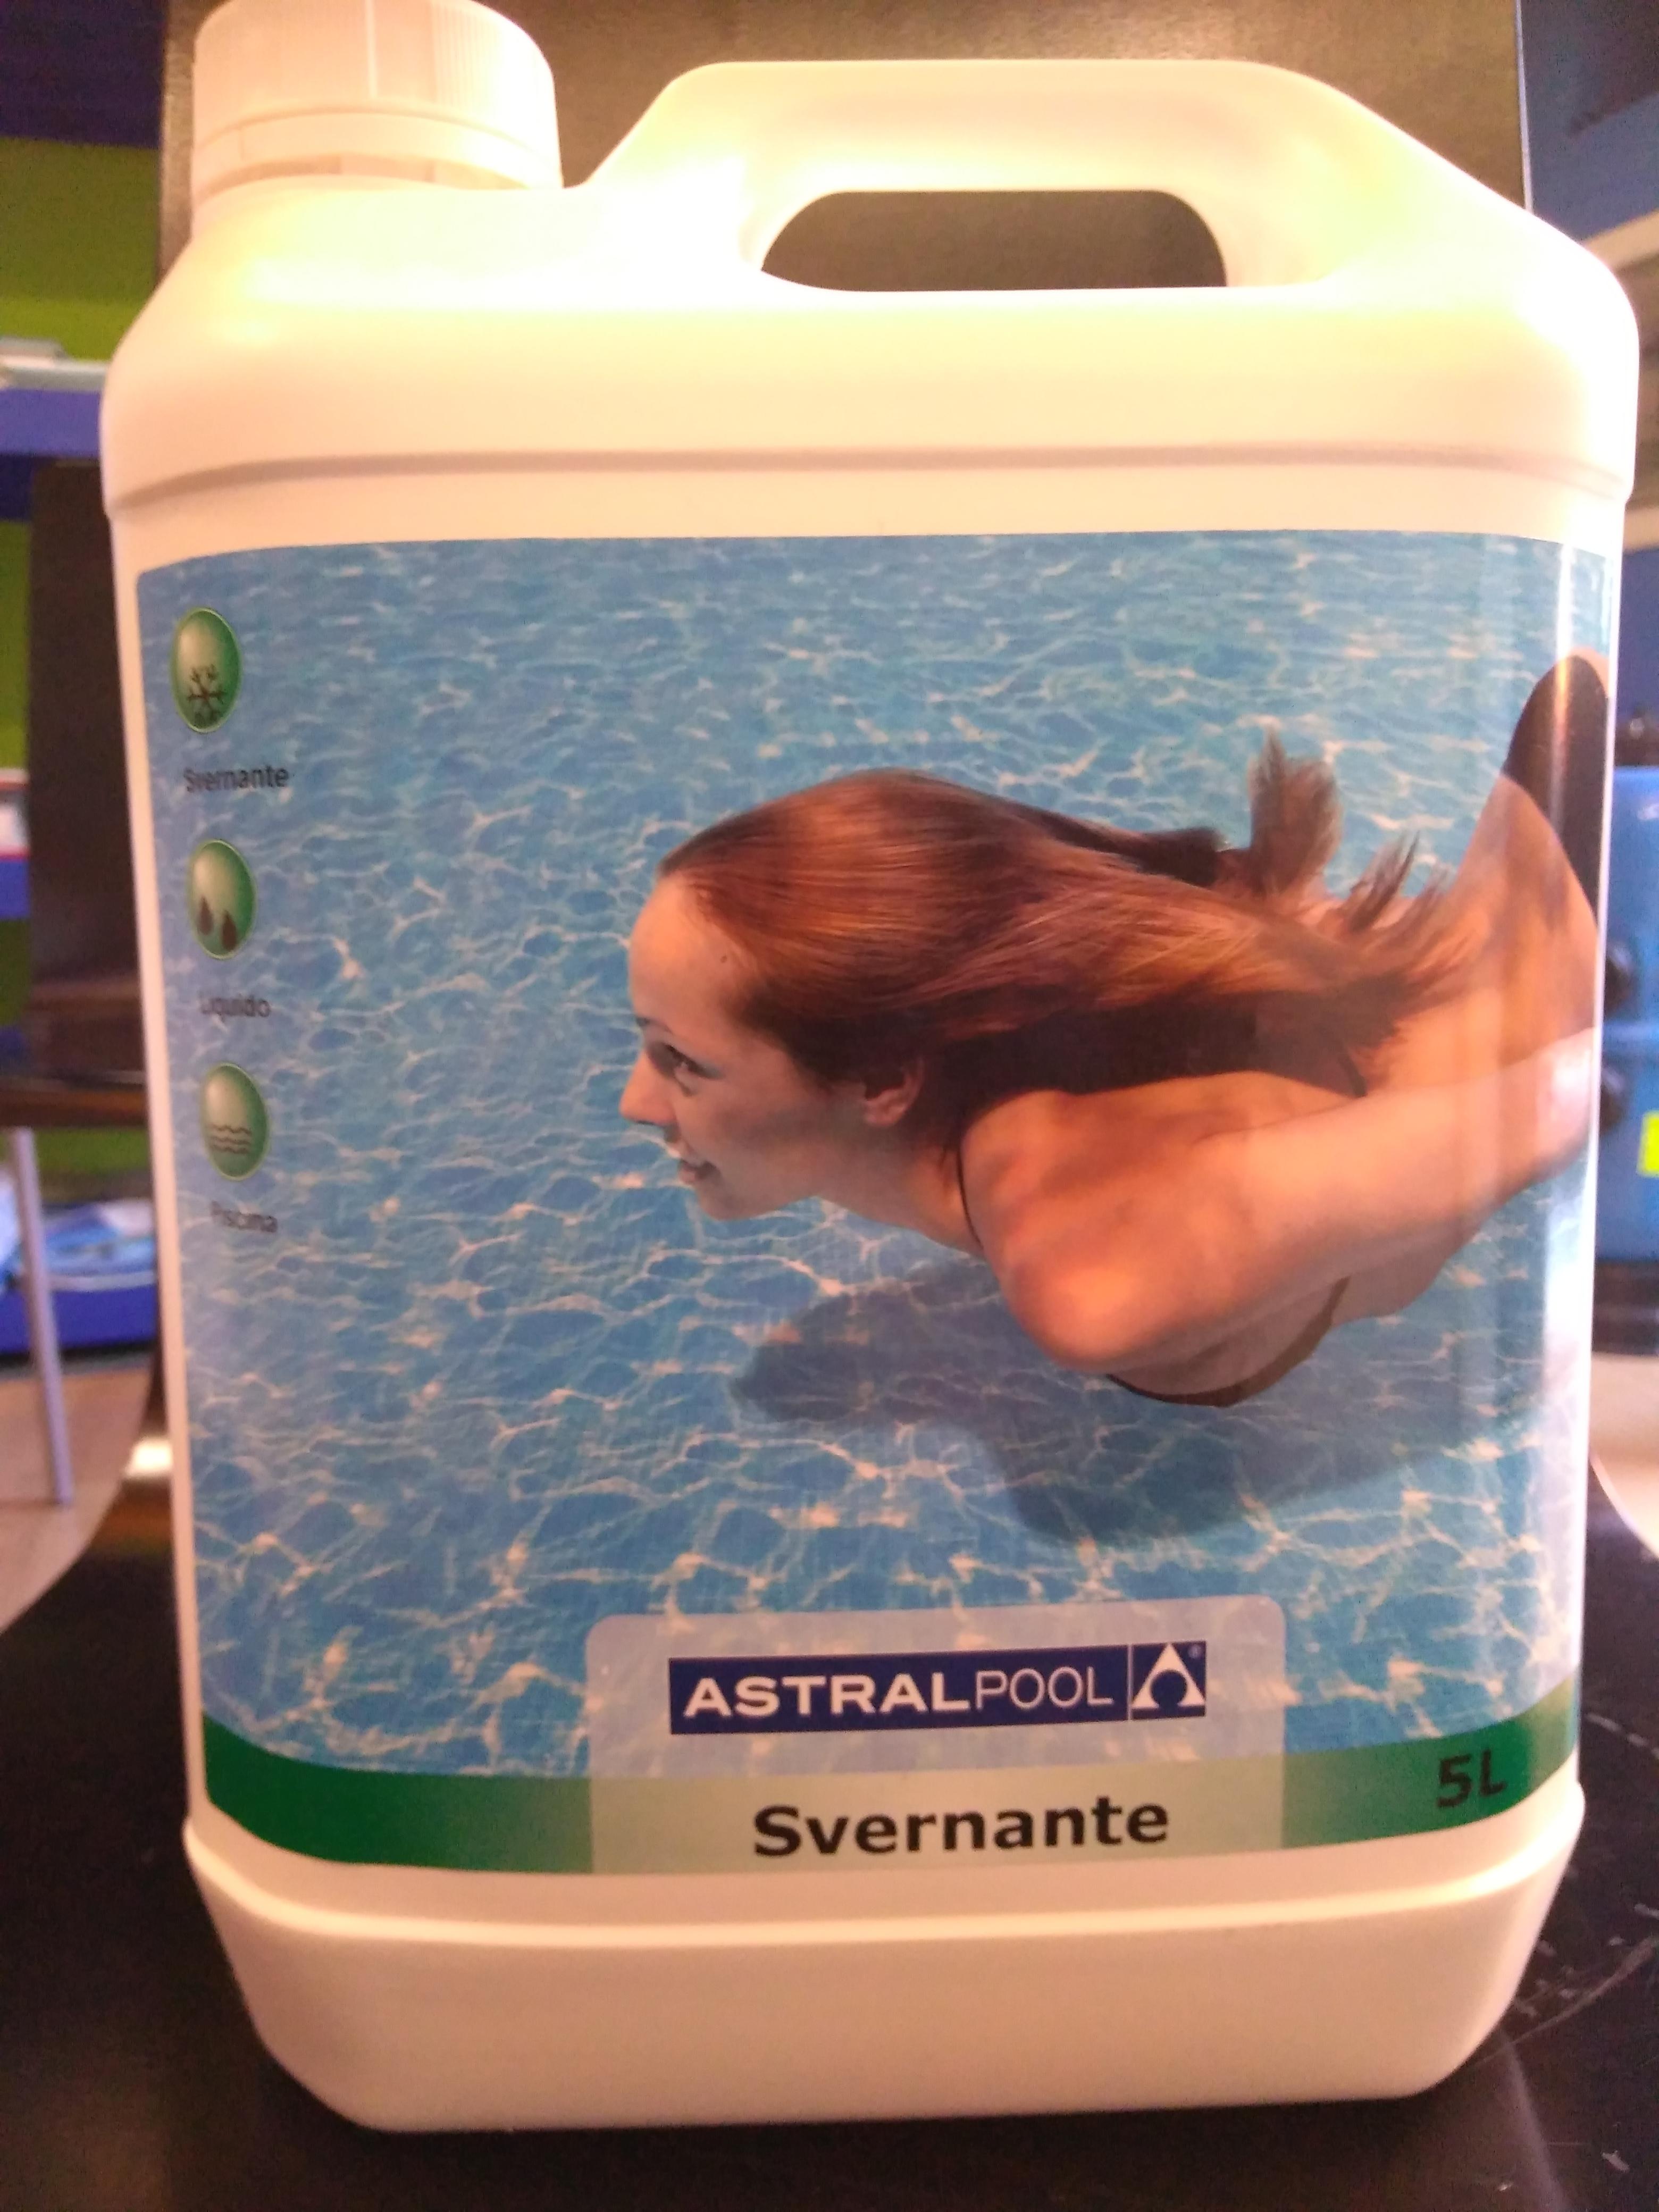 svernante-per-piscina